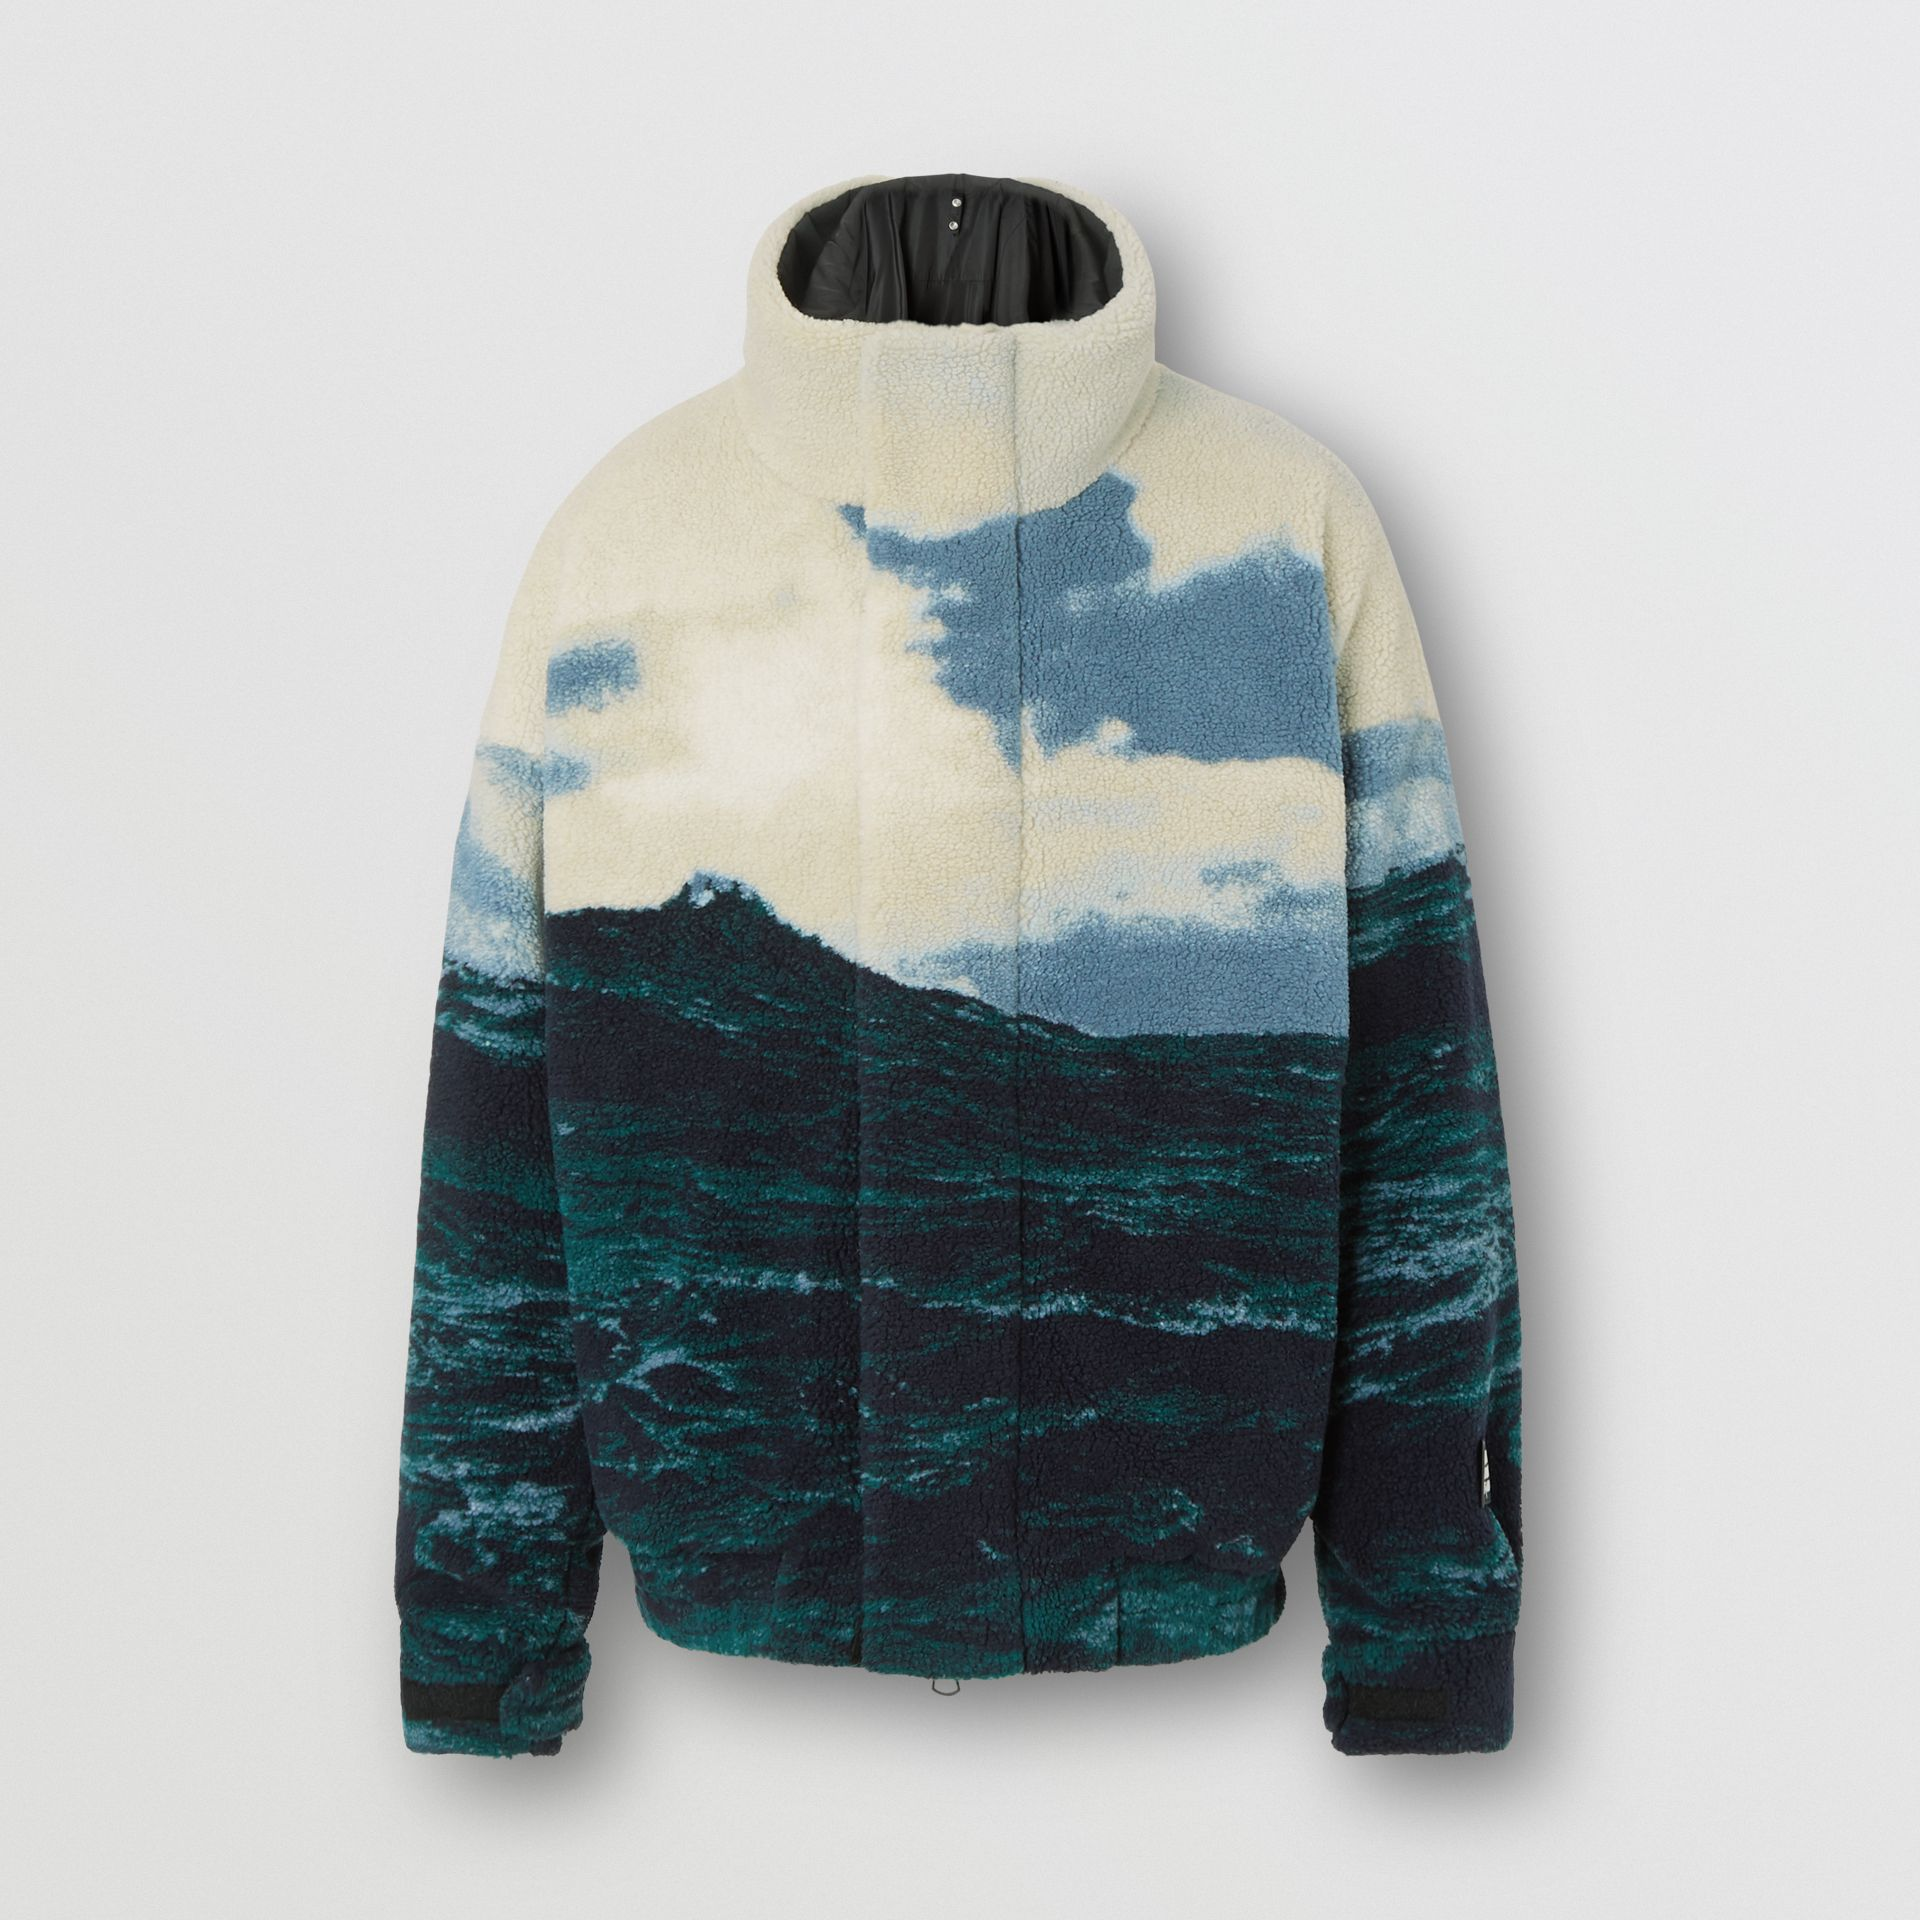 Sea Print Fleece Jacket with Detachable Warmer in Deep Teal - Men | Burberry - gallery image 3